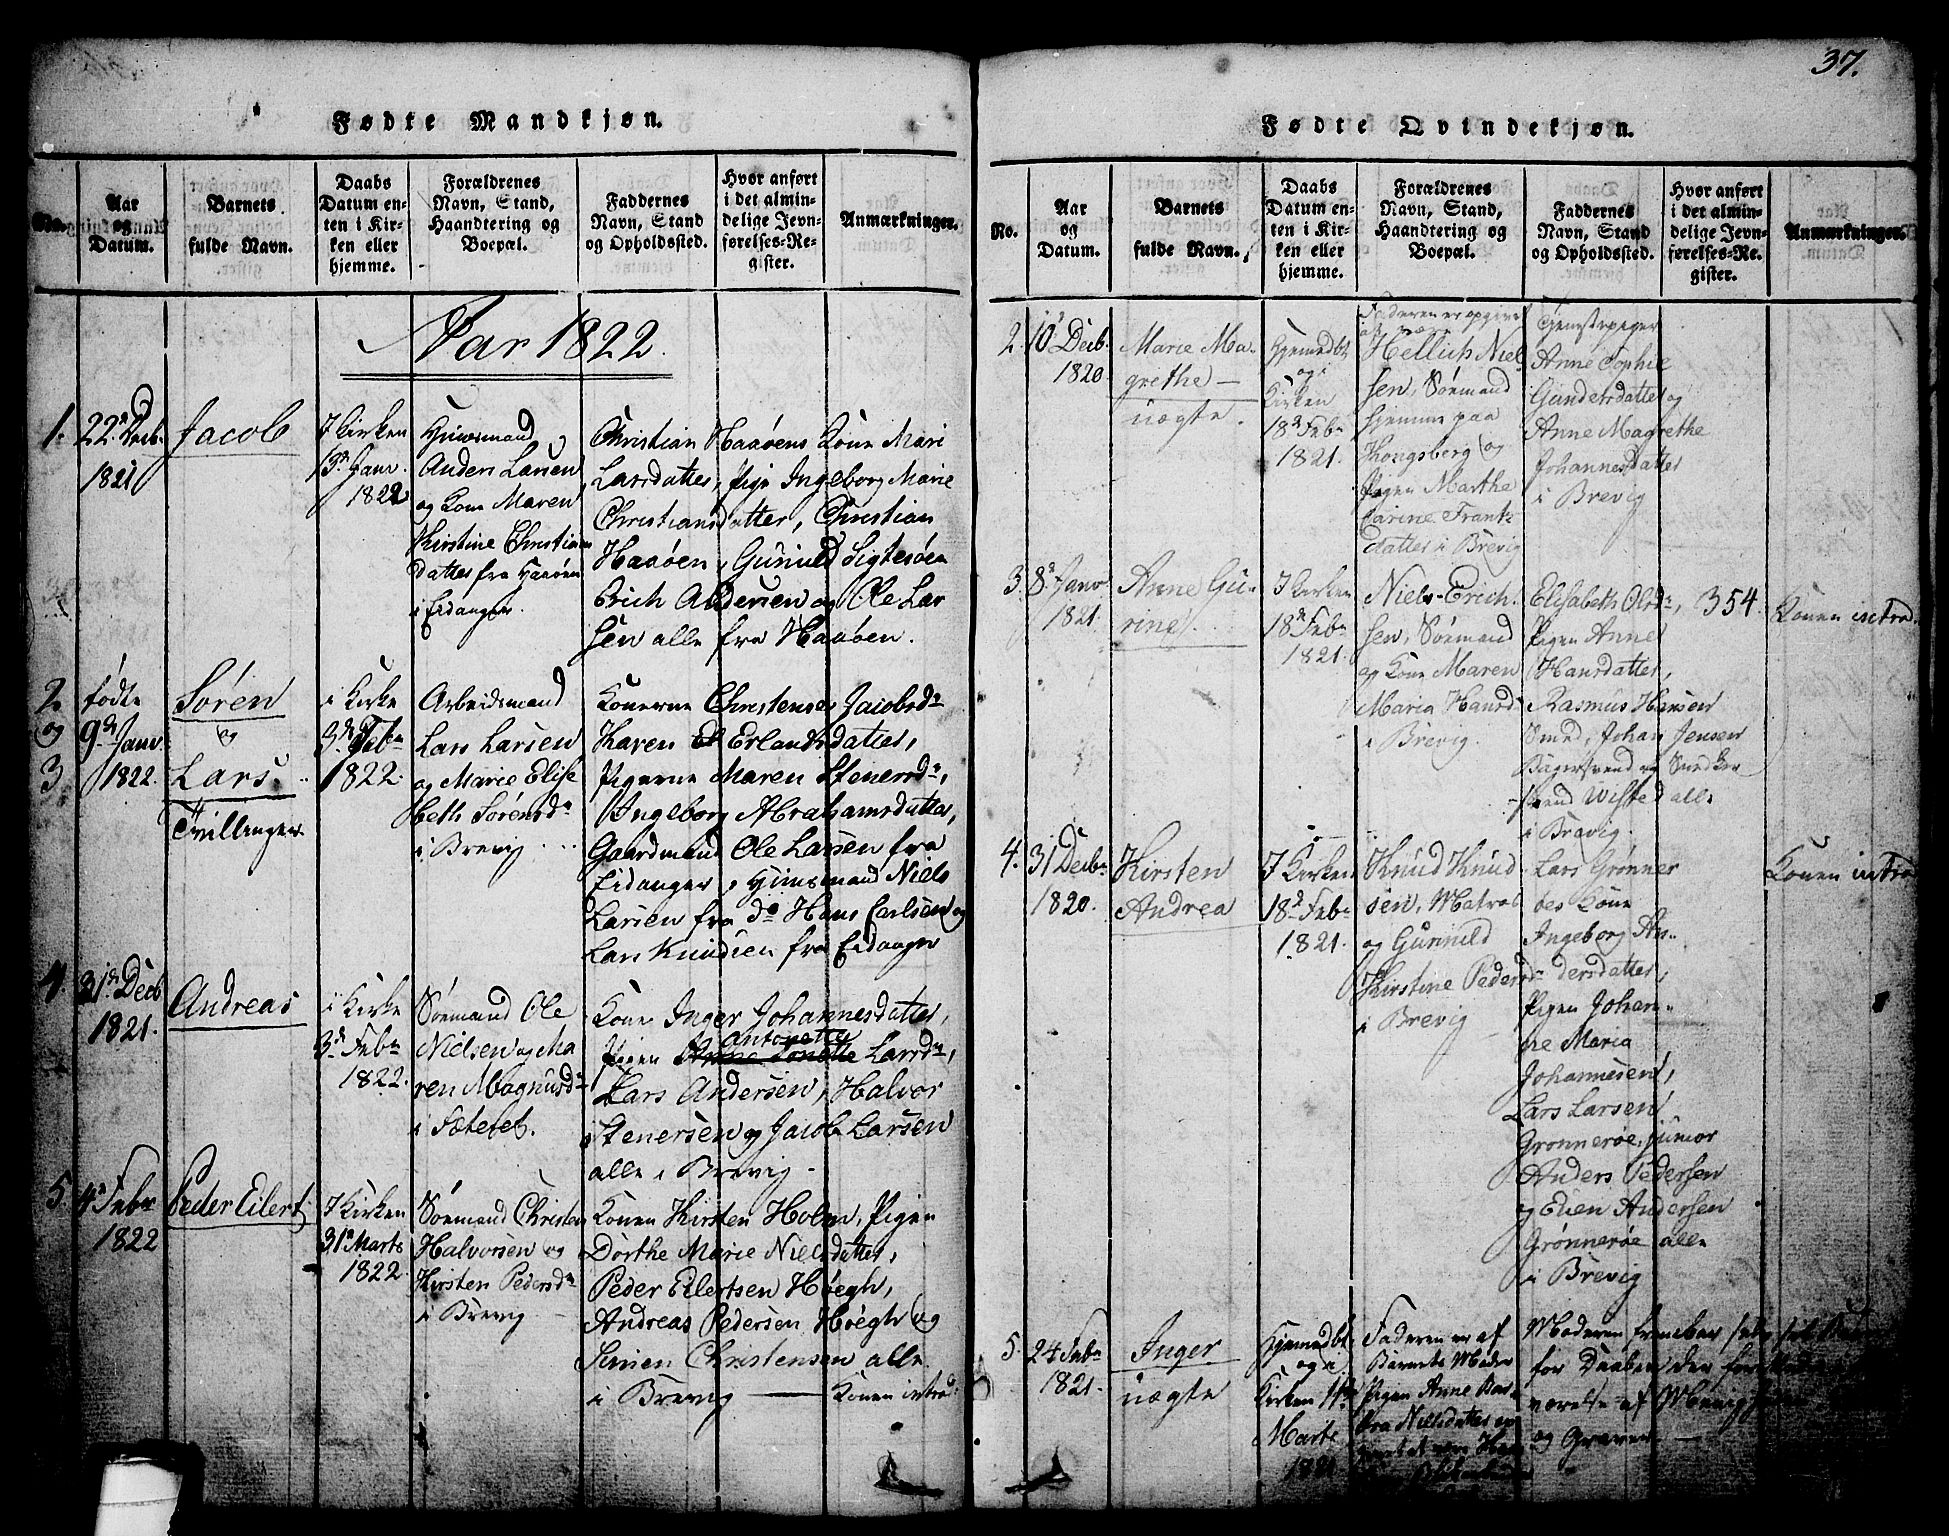 SAKO, Brevik kirkebøker, G/Ga/L0001: Klokkerbok nr. 1, 1814-1845, s. 37